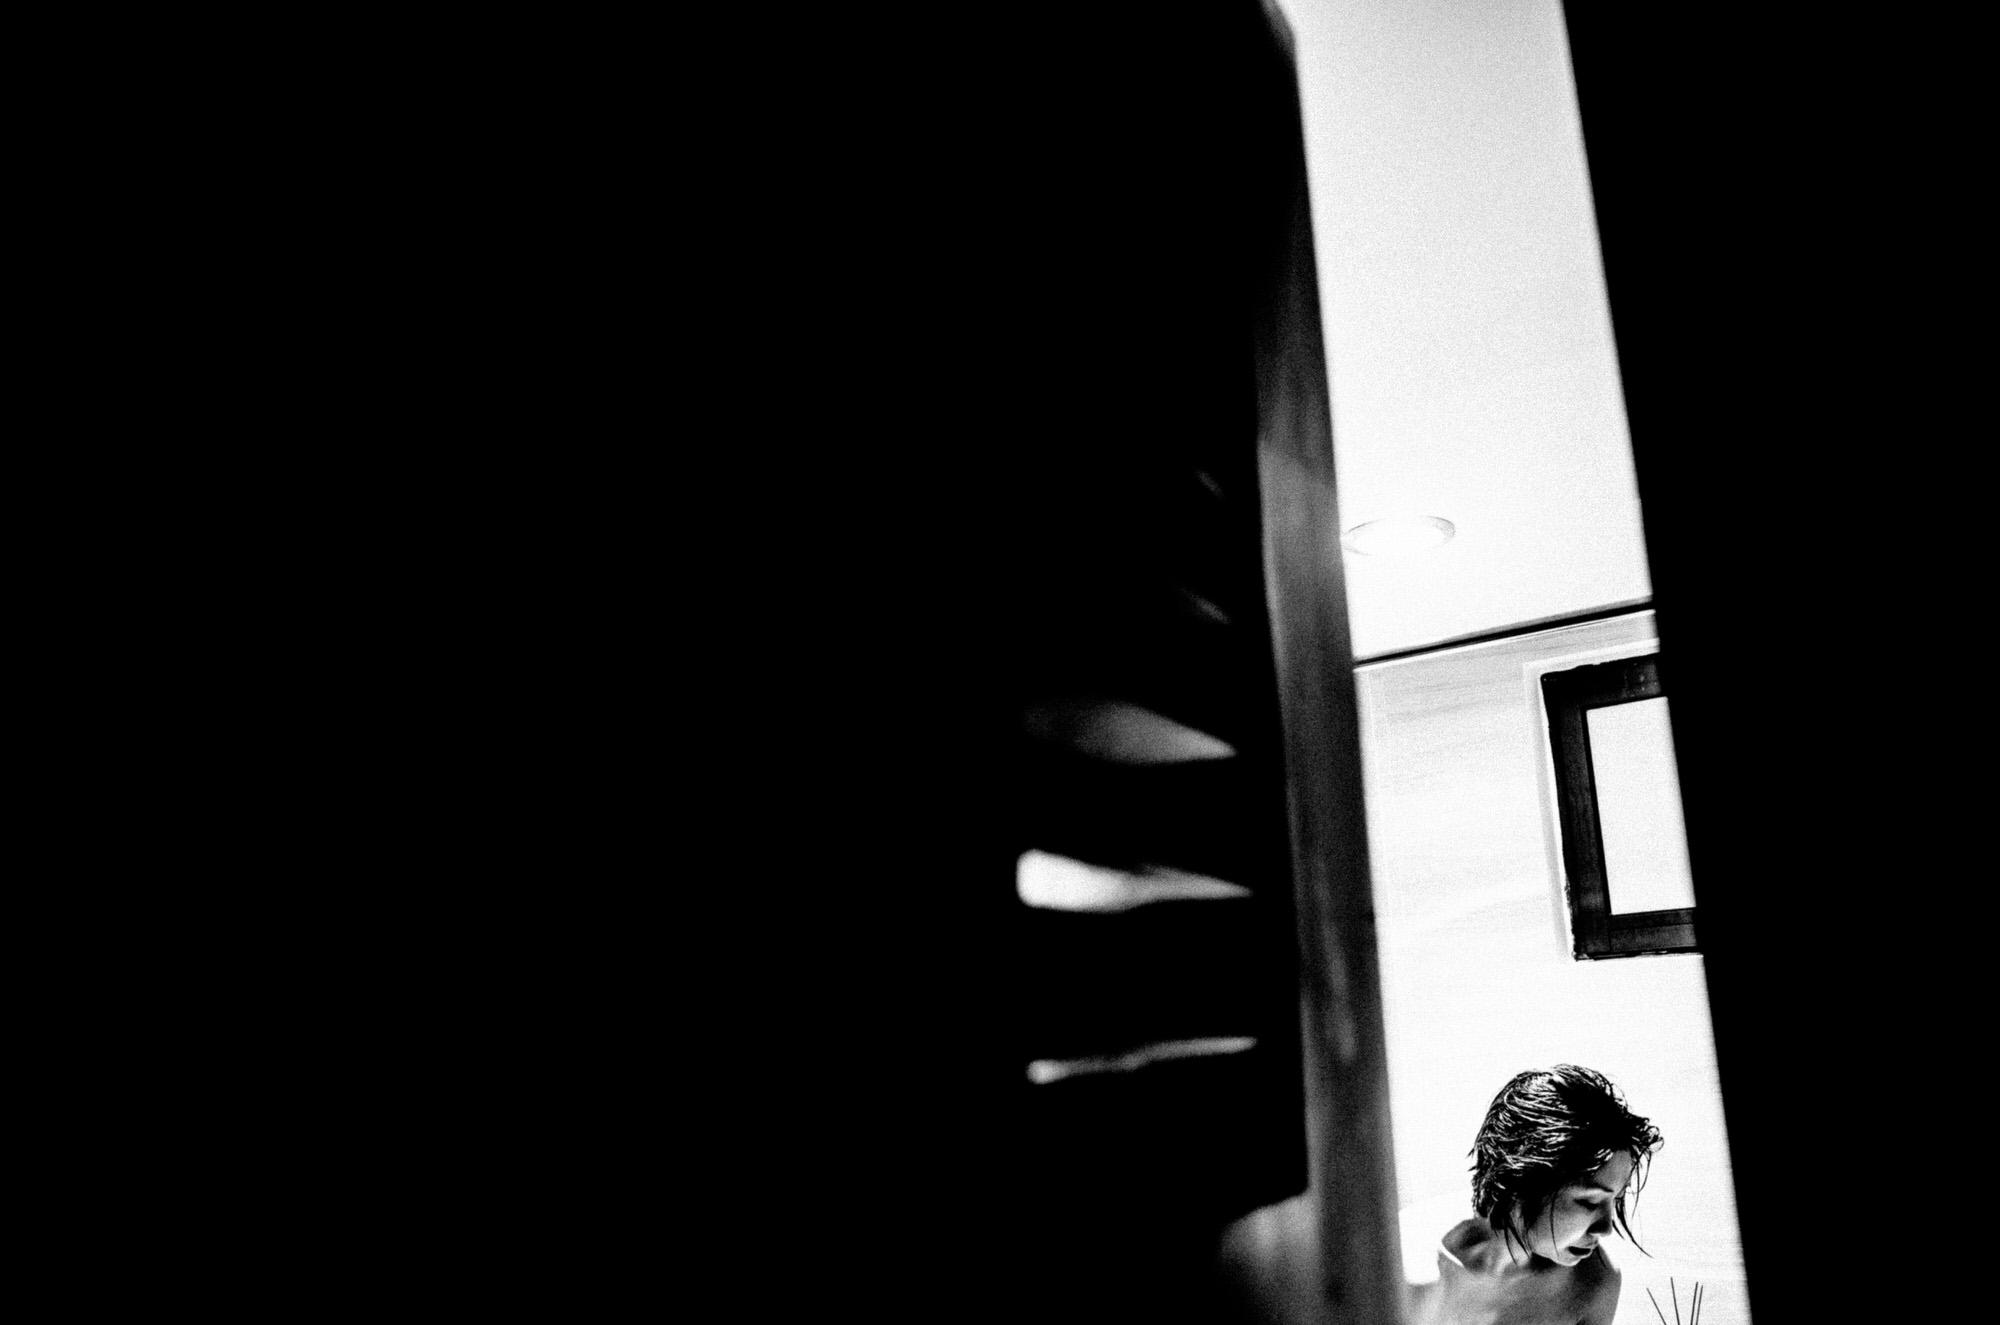 eric kim photography black and white - 32907422163_8a4c8e485b_o